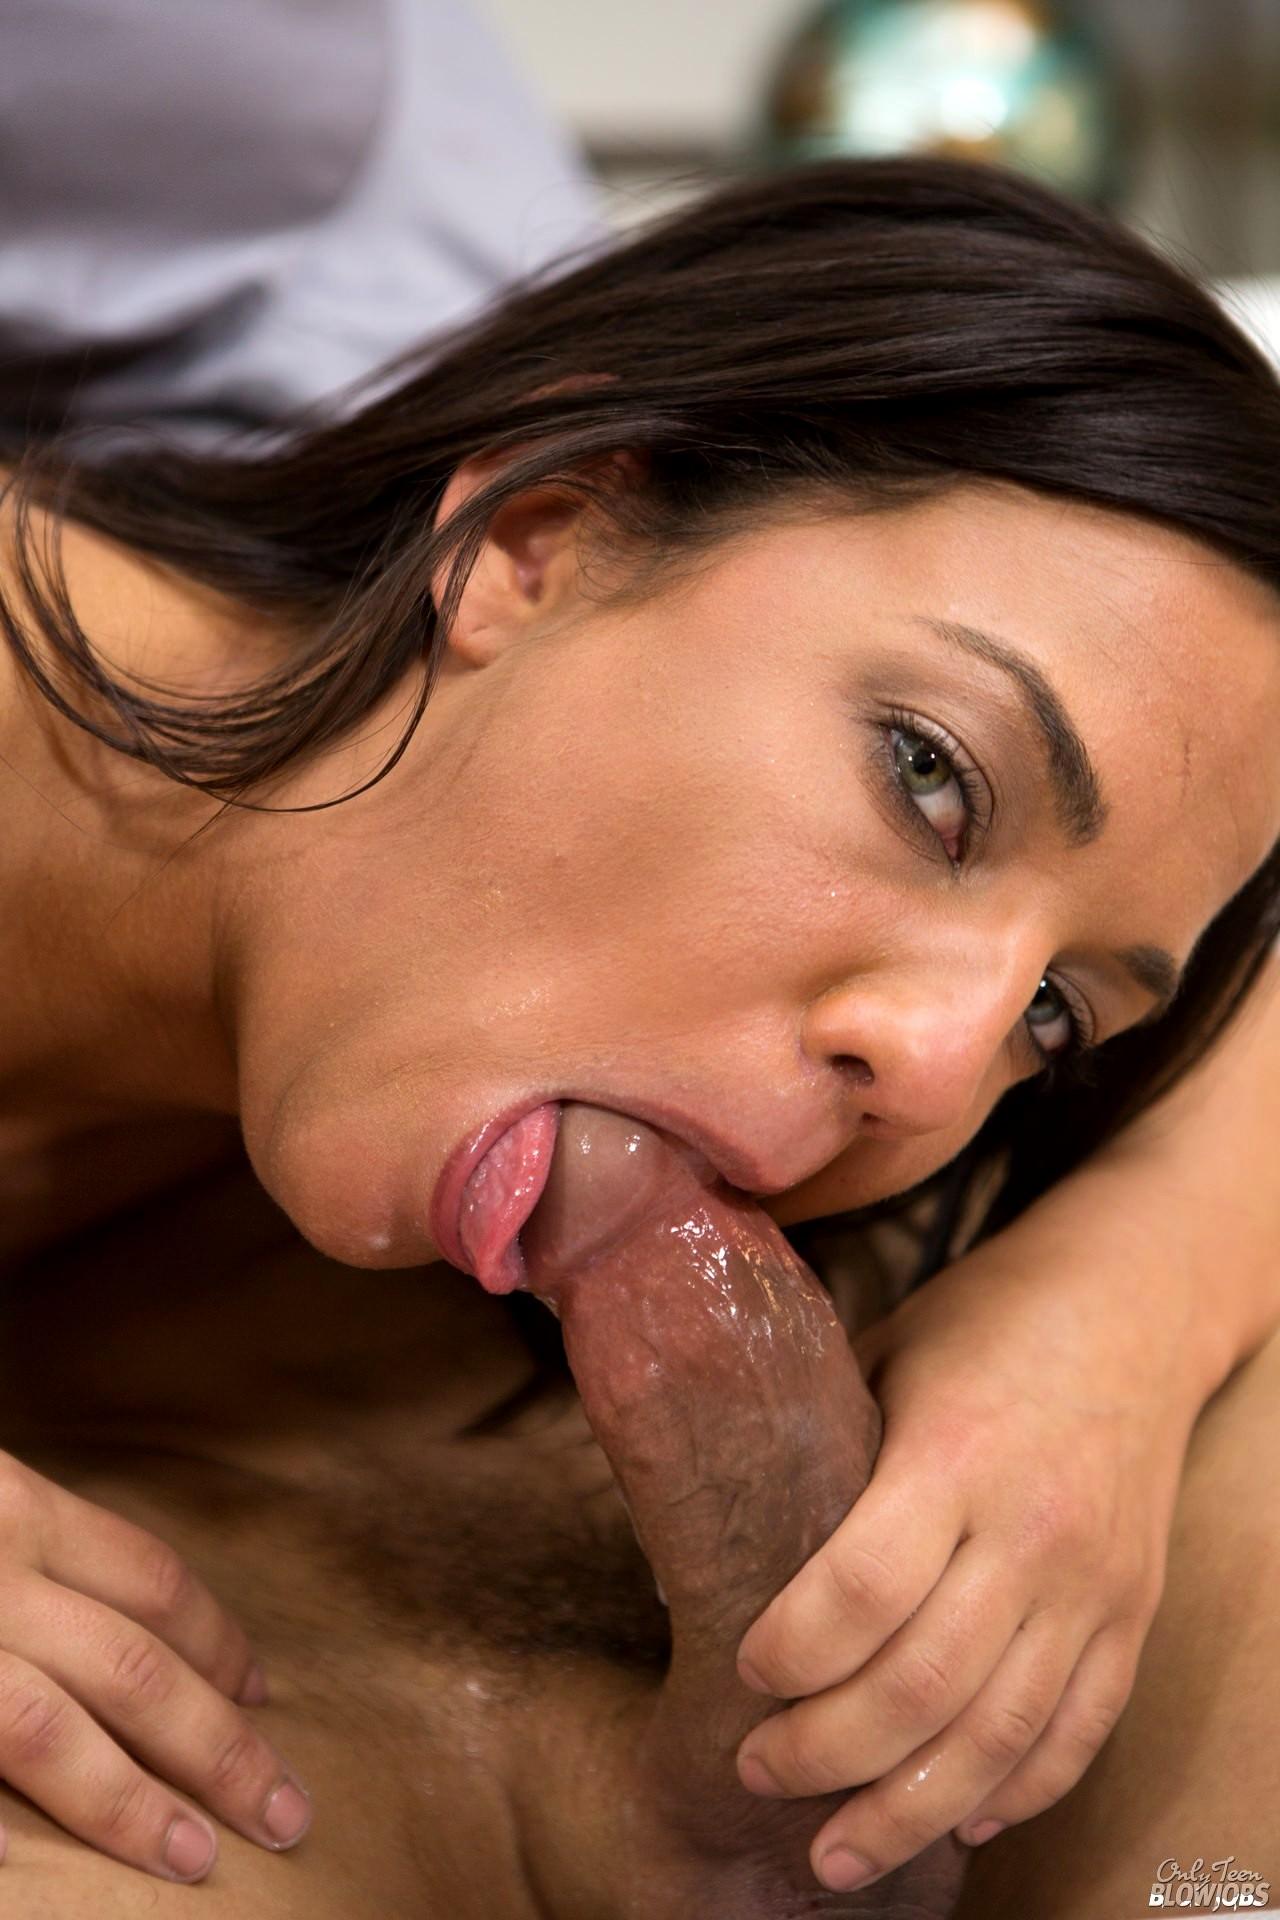 Babe Today Only Teen Blowjobs Amara Romani Virgin Blowjob -3419